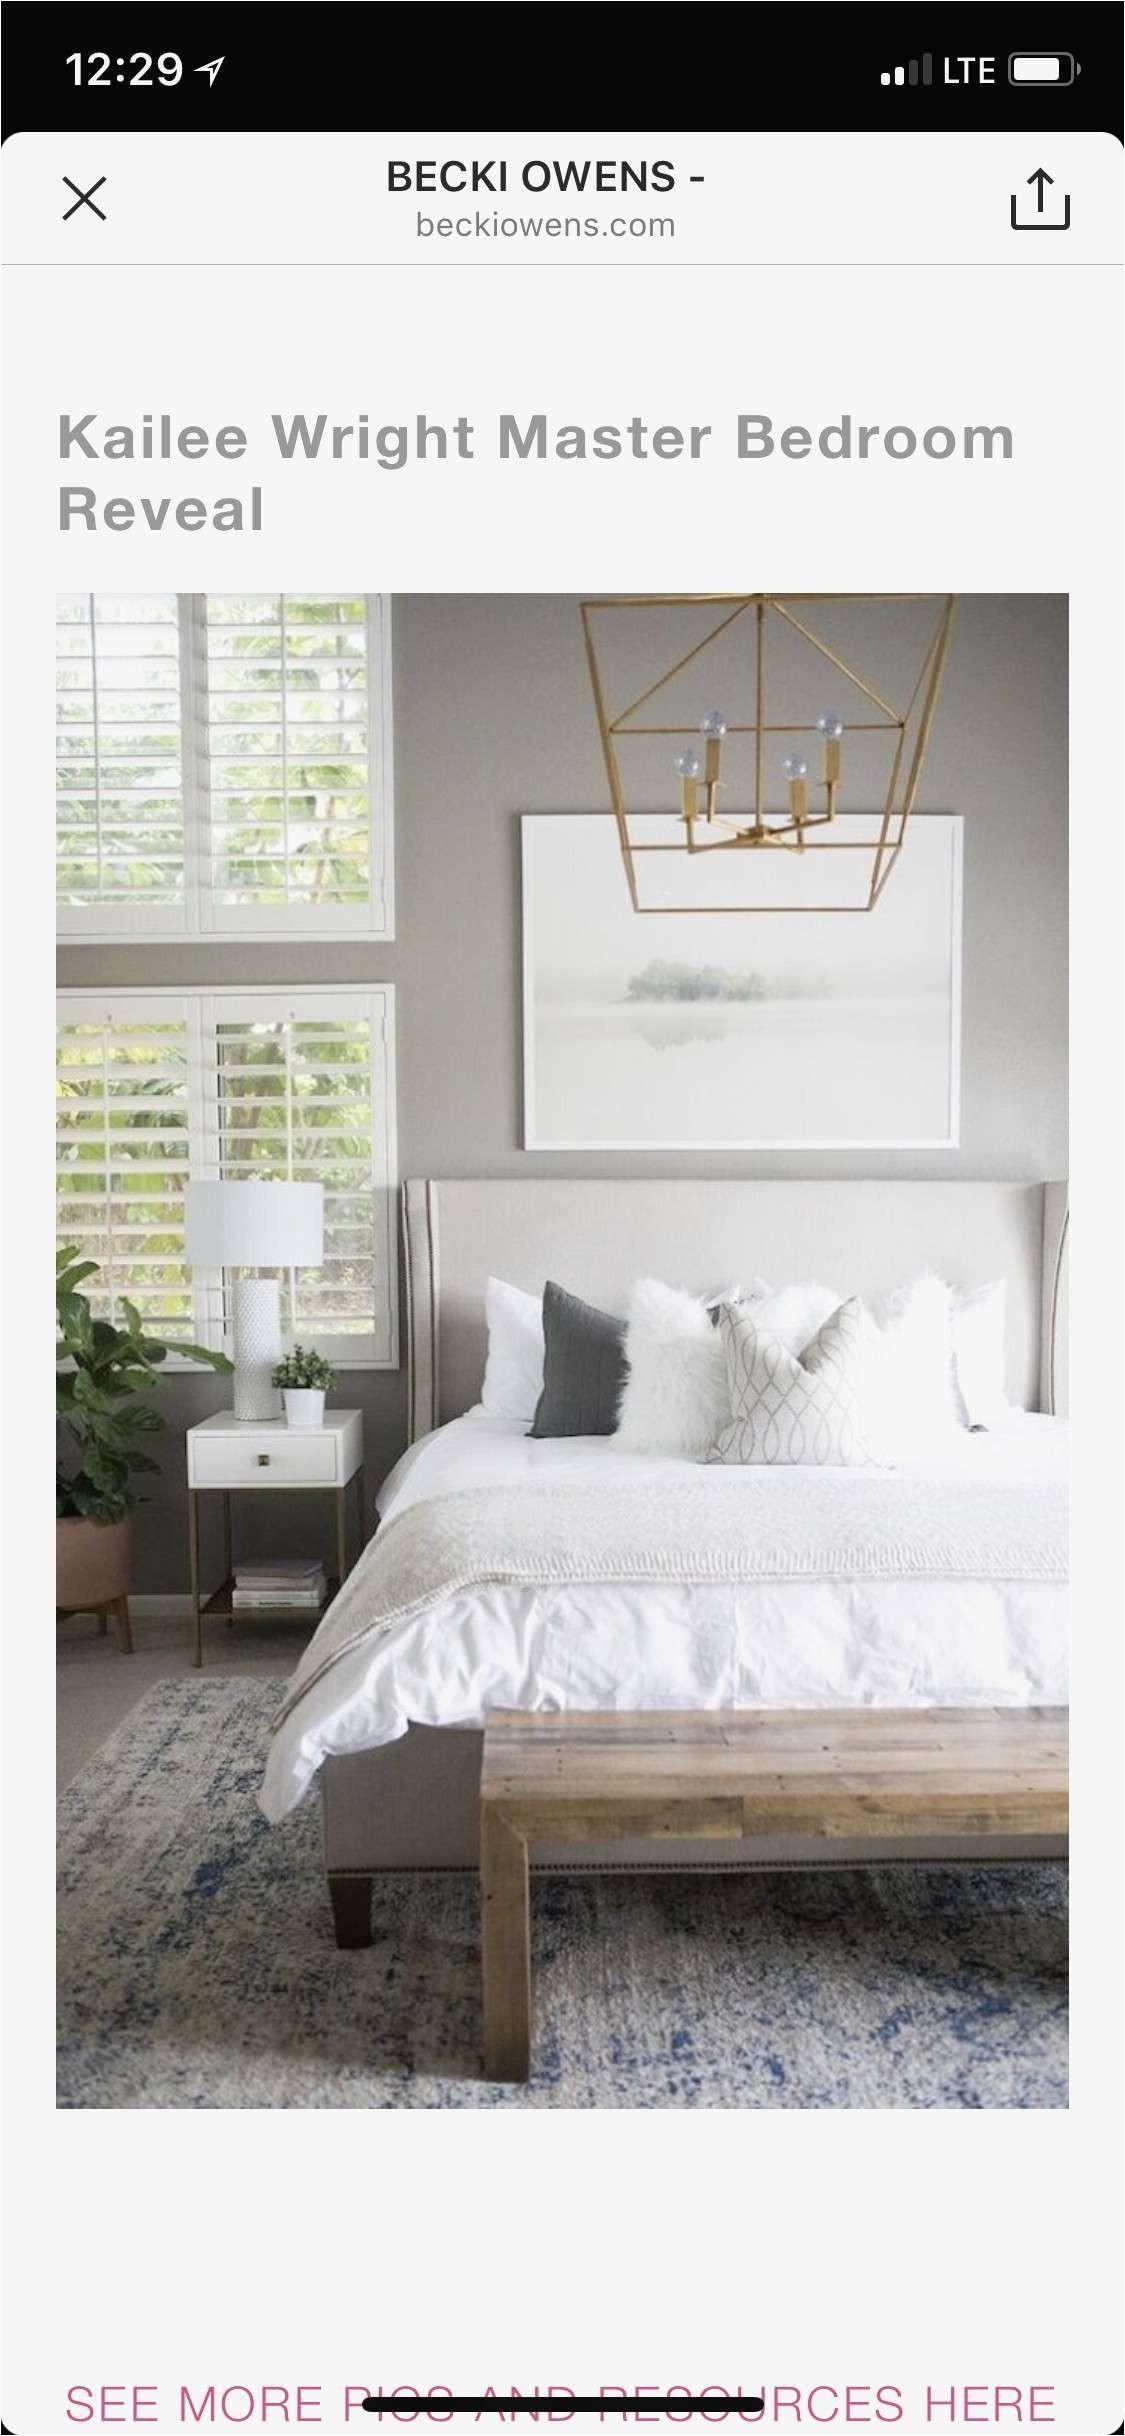 Modern Bedrooms Interior Design 2018 Purple Bedroom Ideas Elegant Modern White Walls New Brick Walls 0d